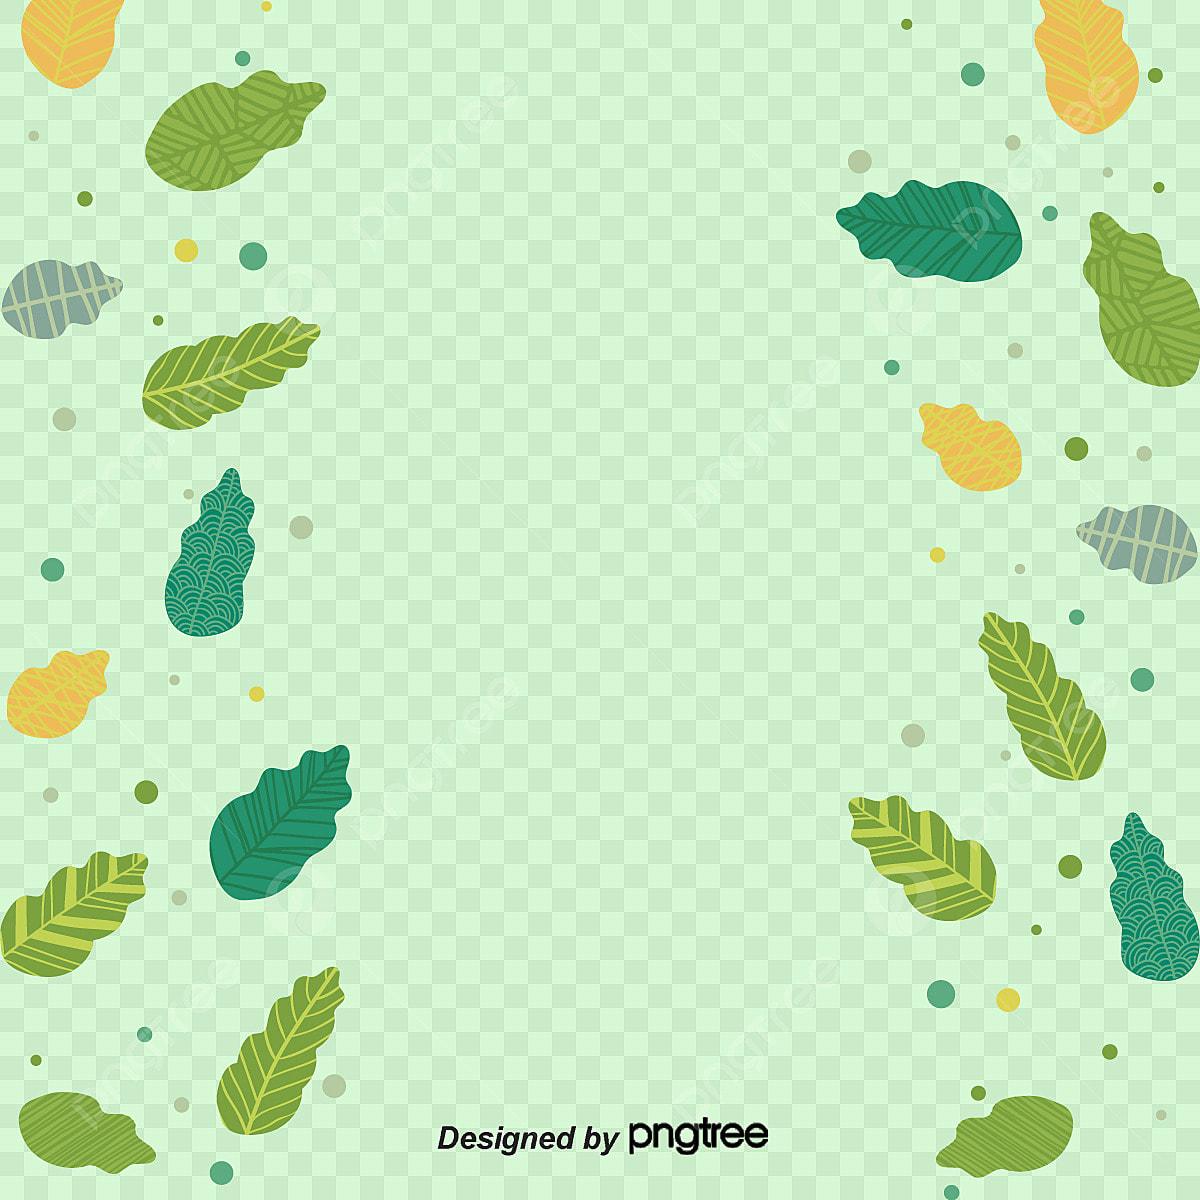 Fall leaves descargar fall leaf amarillo png y vector para - Descargar autumn leaves ...